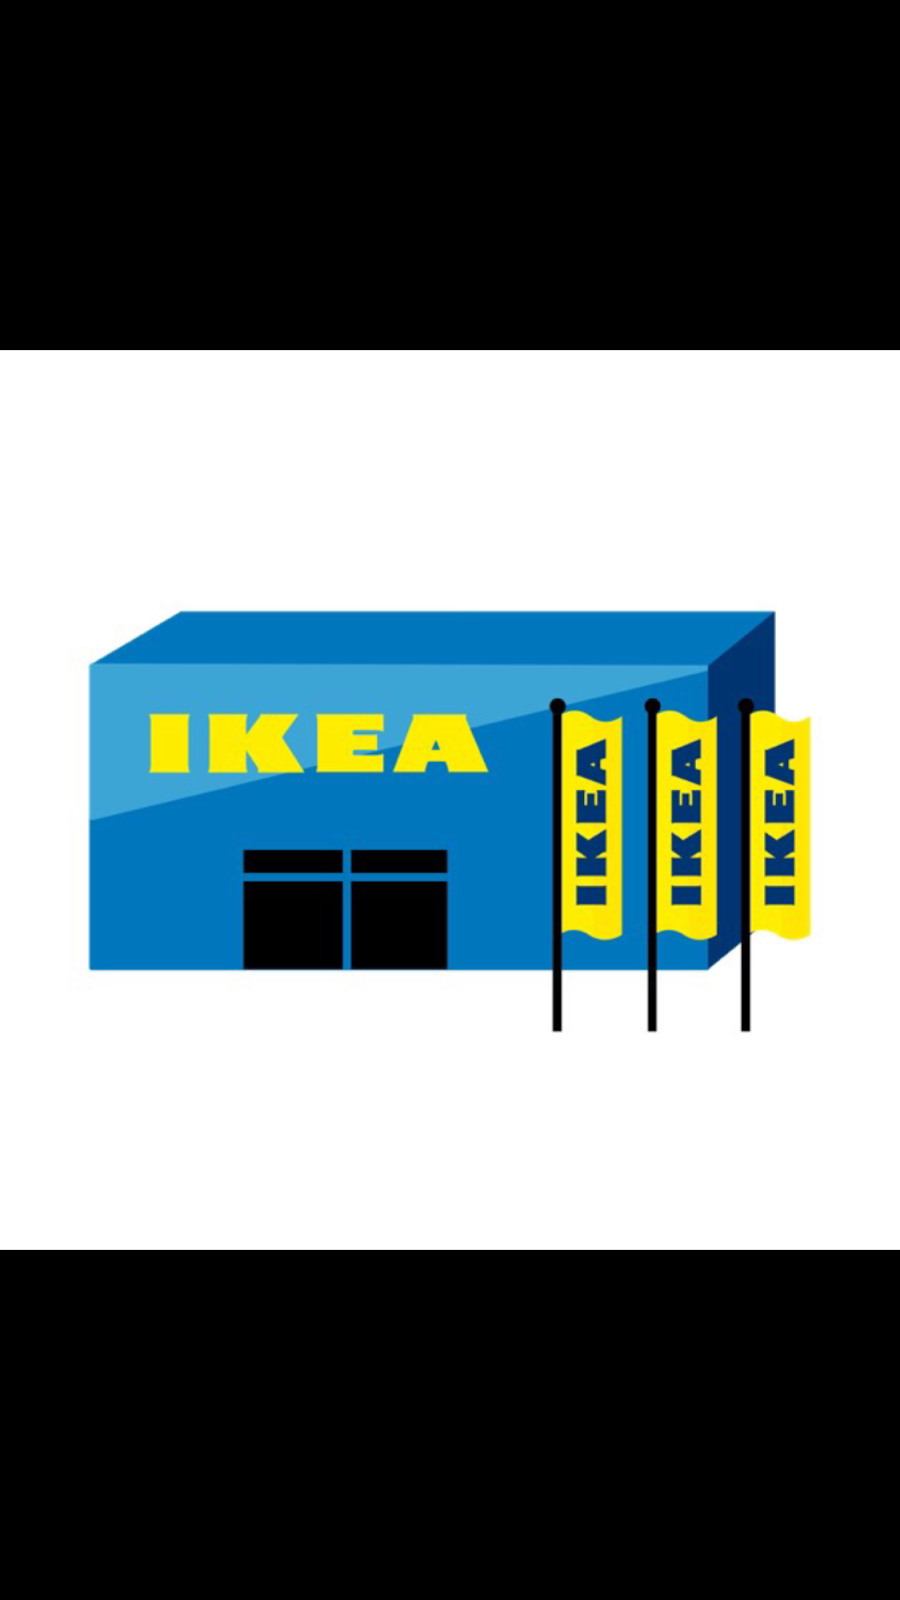 Ikea emoticons emoji